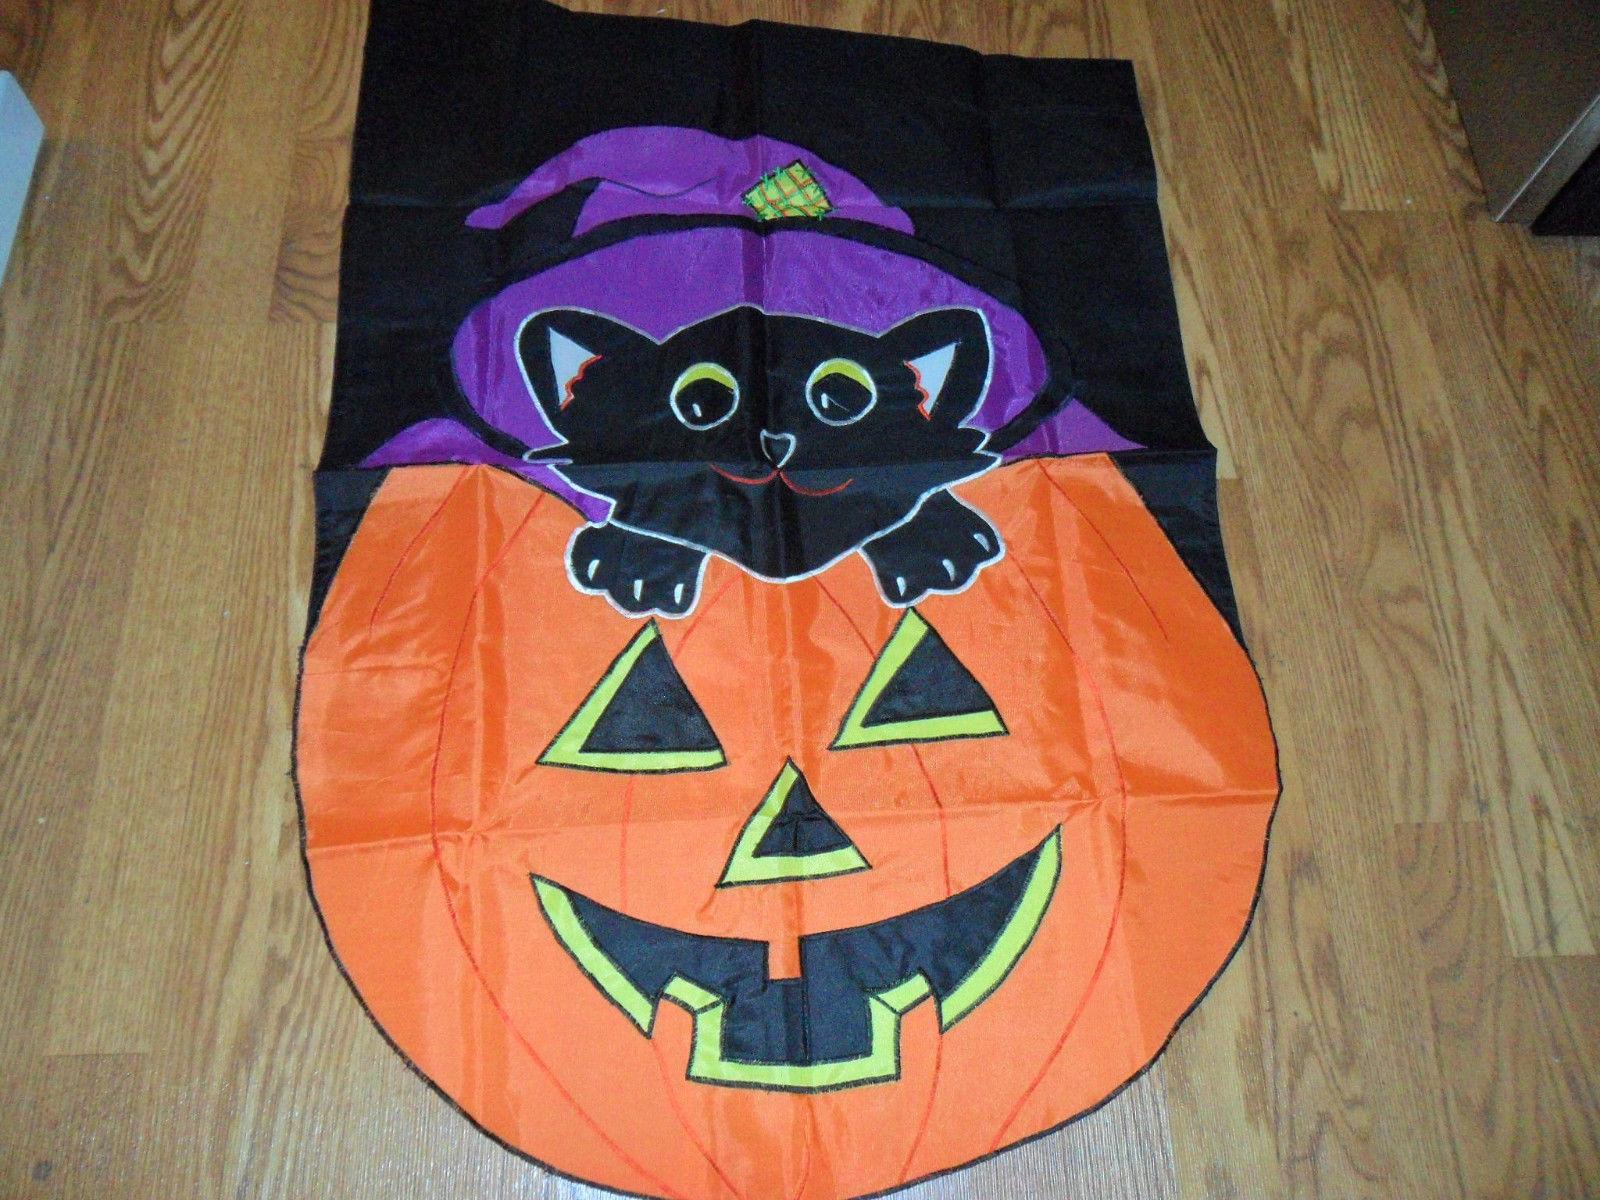 Halloween Black Cat on Pumpkin Garden Flag - $19.99